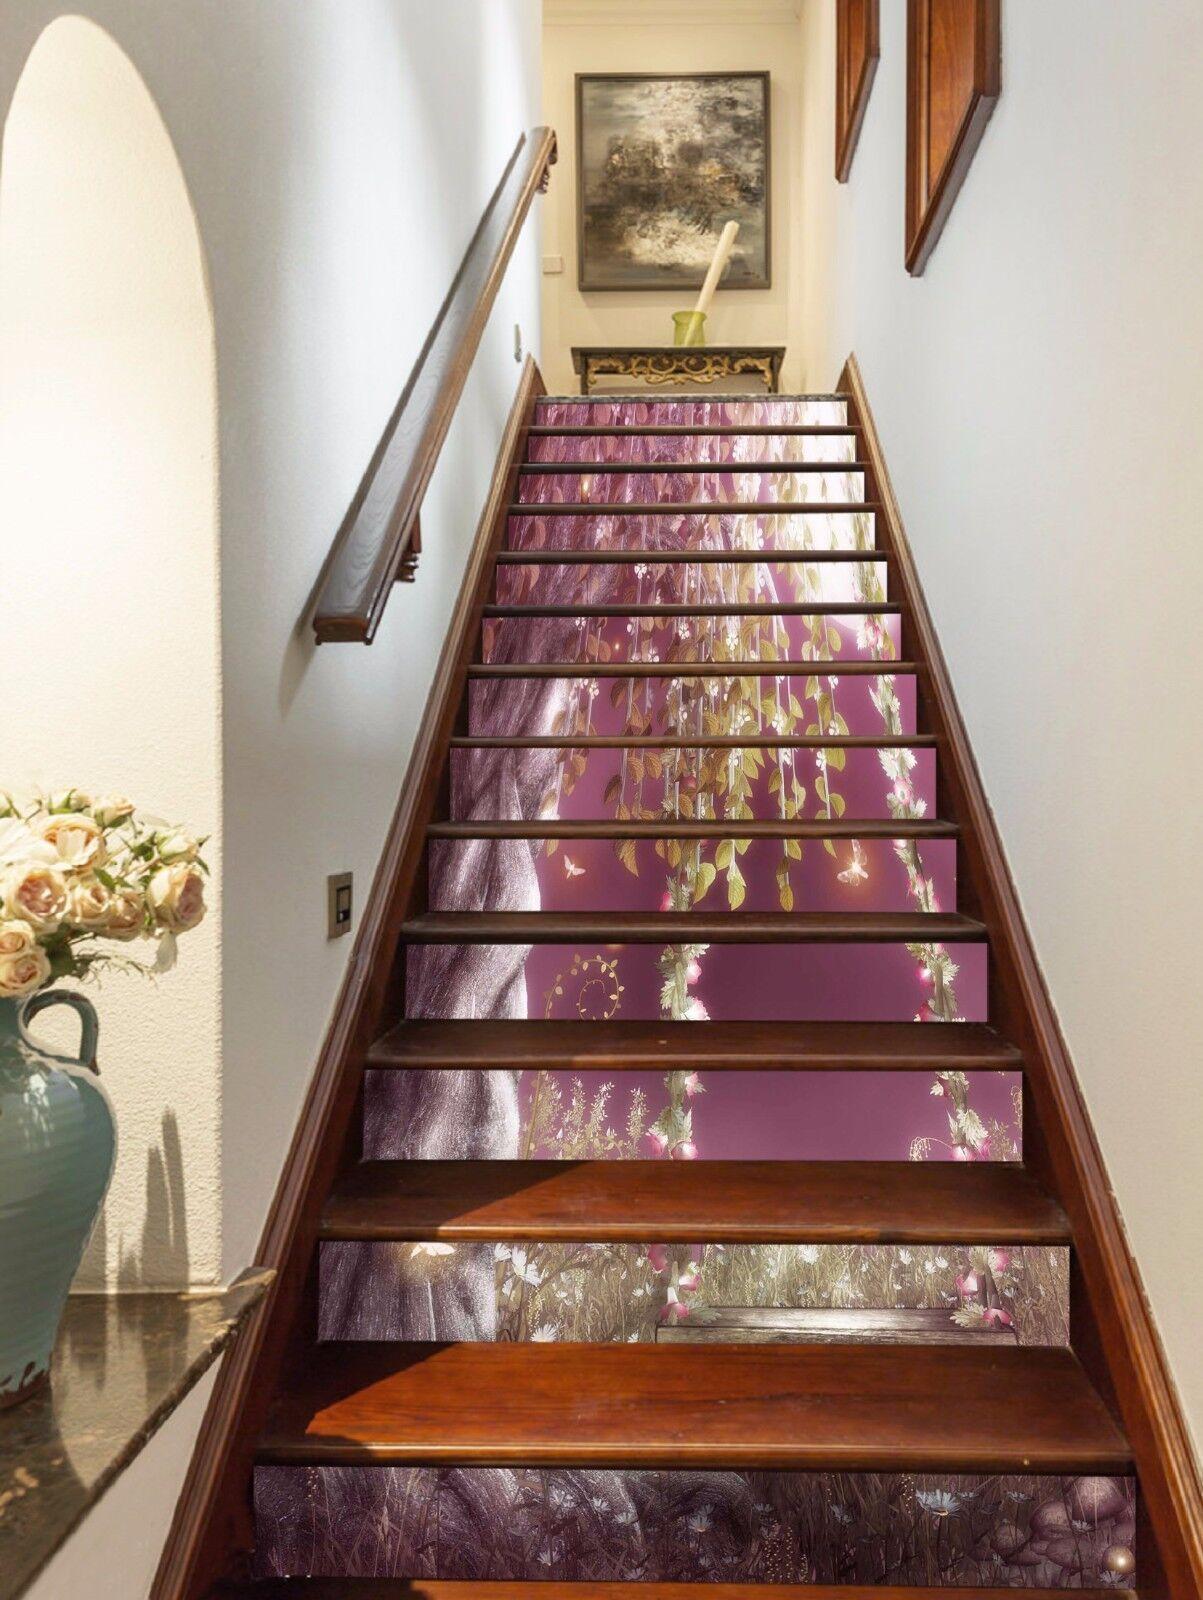 3D Mond Garten 7581 Stair Risers Dekoration Fototapete Vinyl Aufkleber Tapete DE